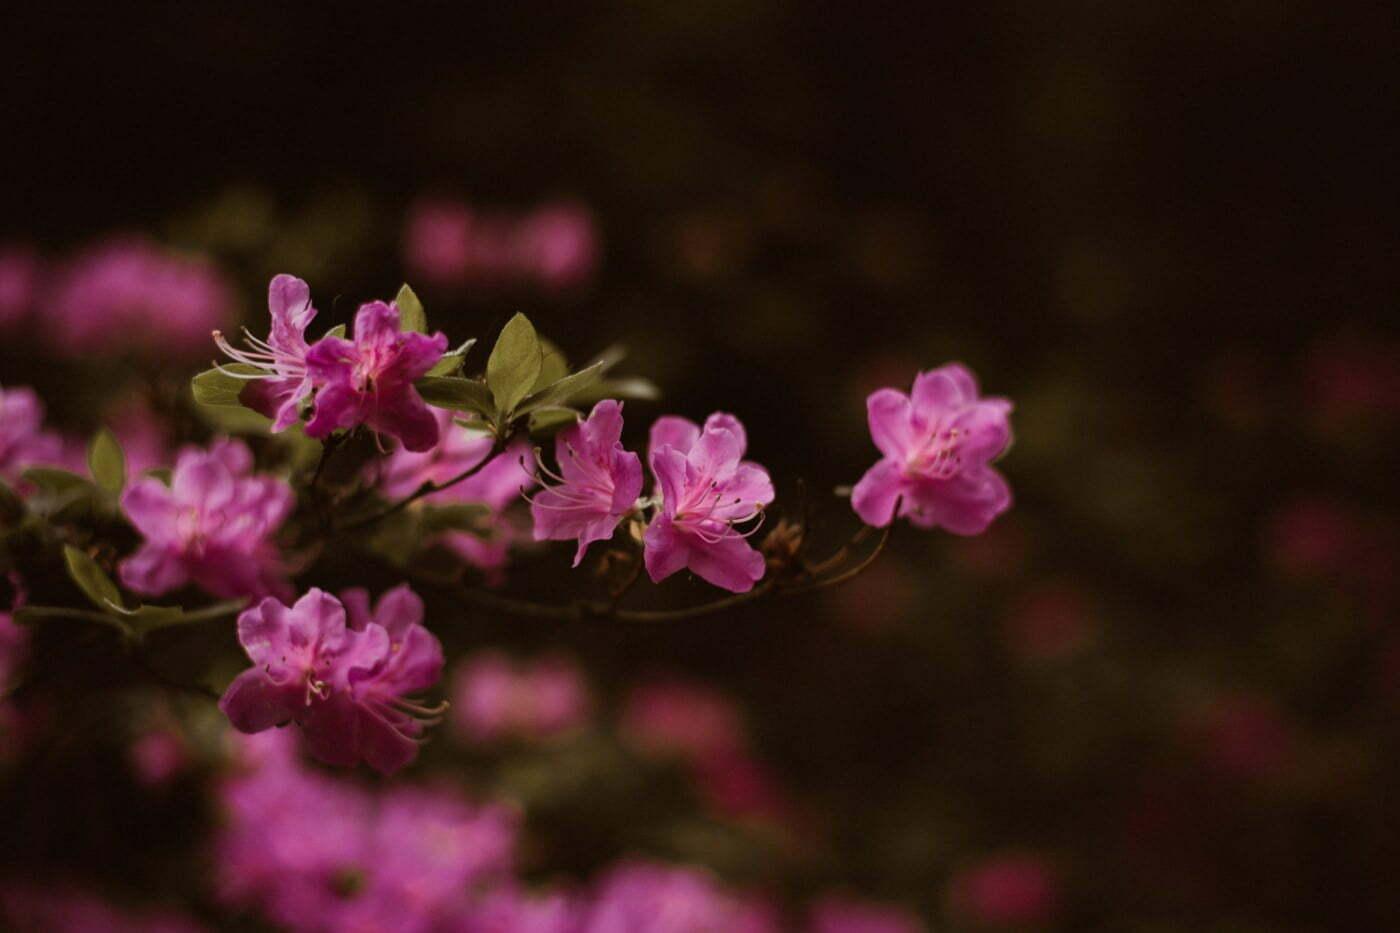 ewelina zieba sesja narzeczenska kwiaty warszawa 01